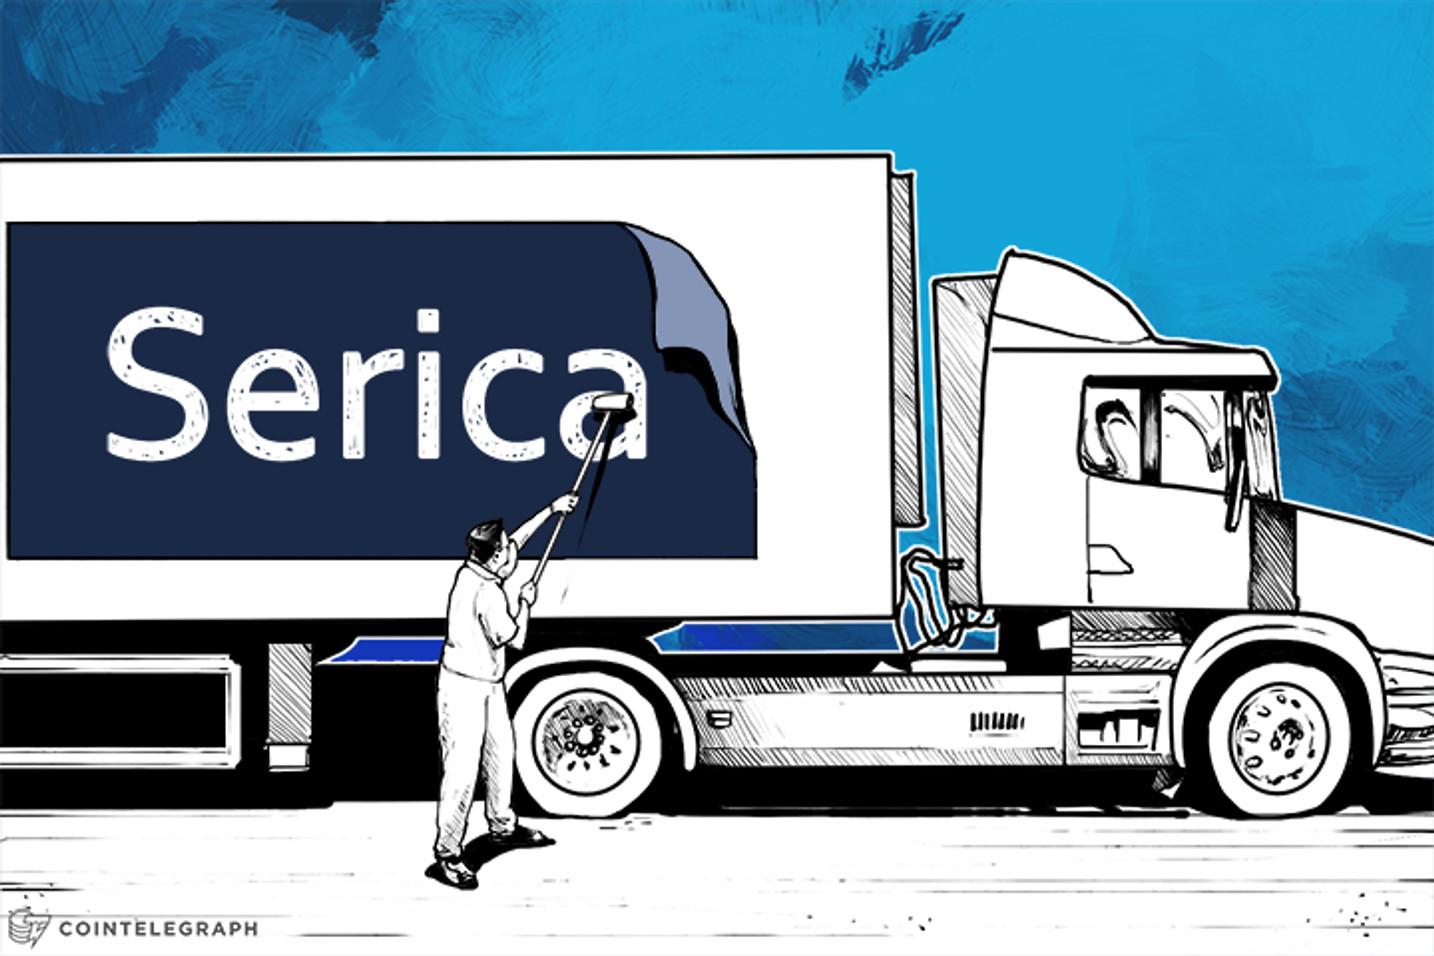 DigitalTangible Rebrands as Serica for Asset Trading 'Beyond Precious Metals'